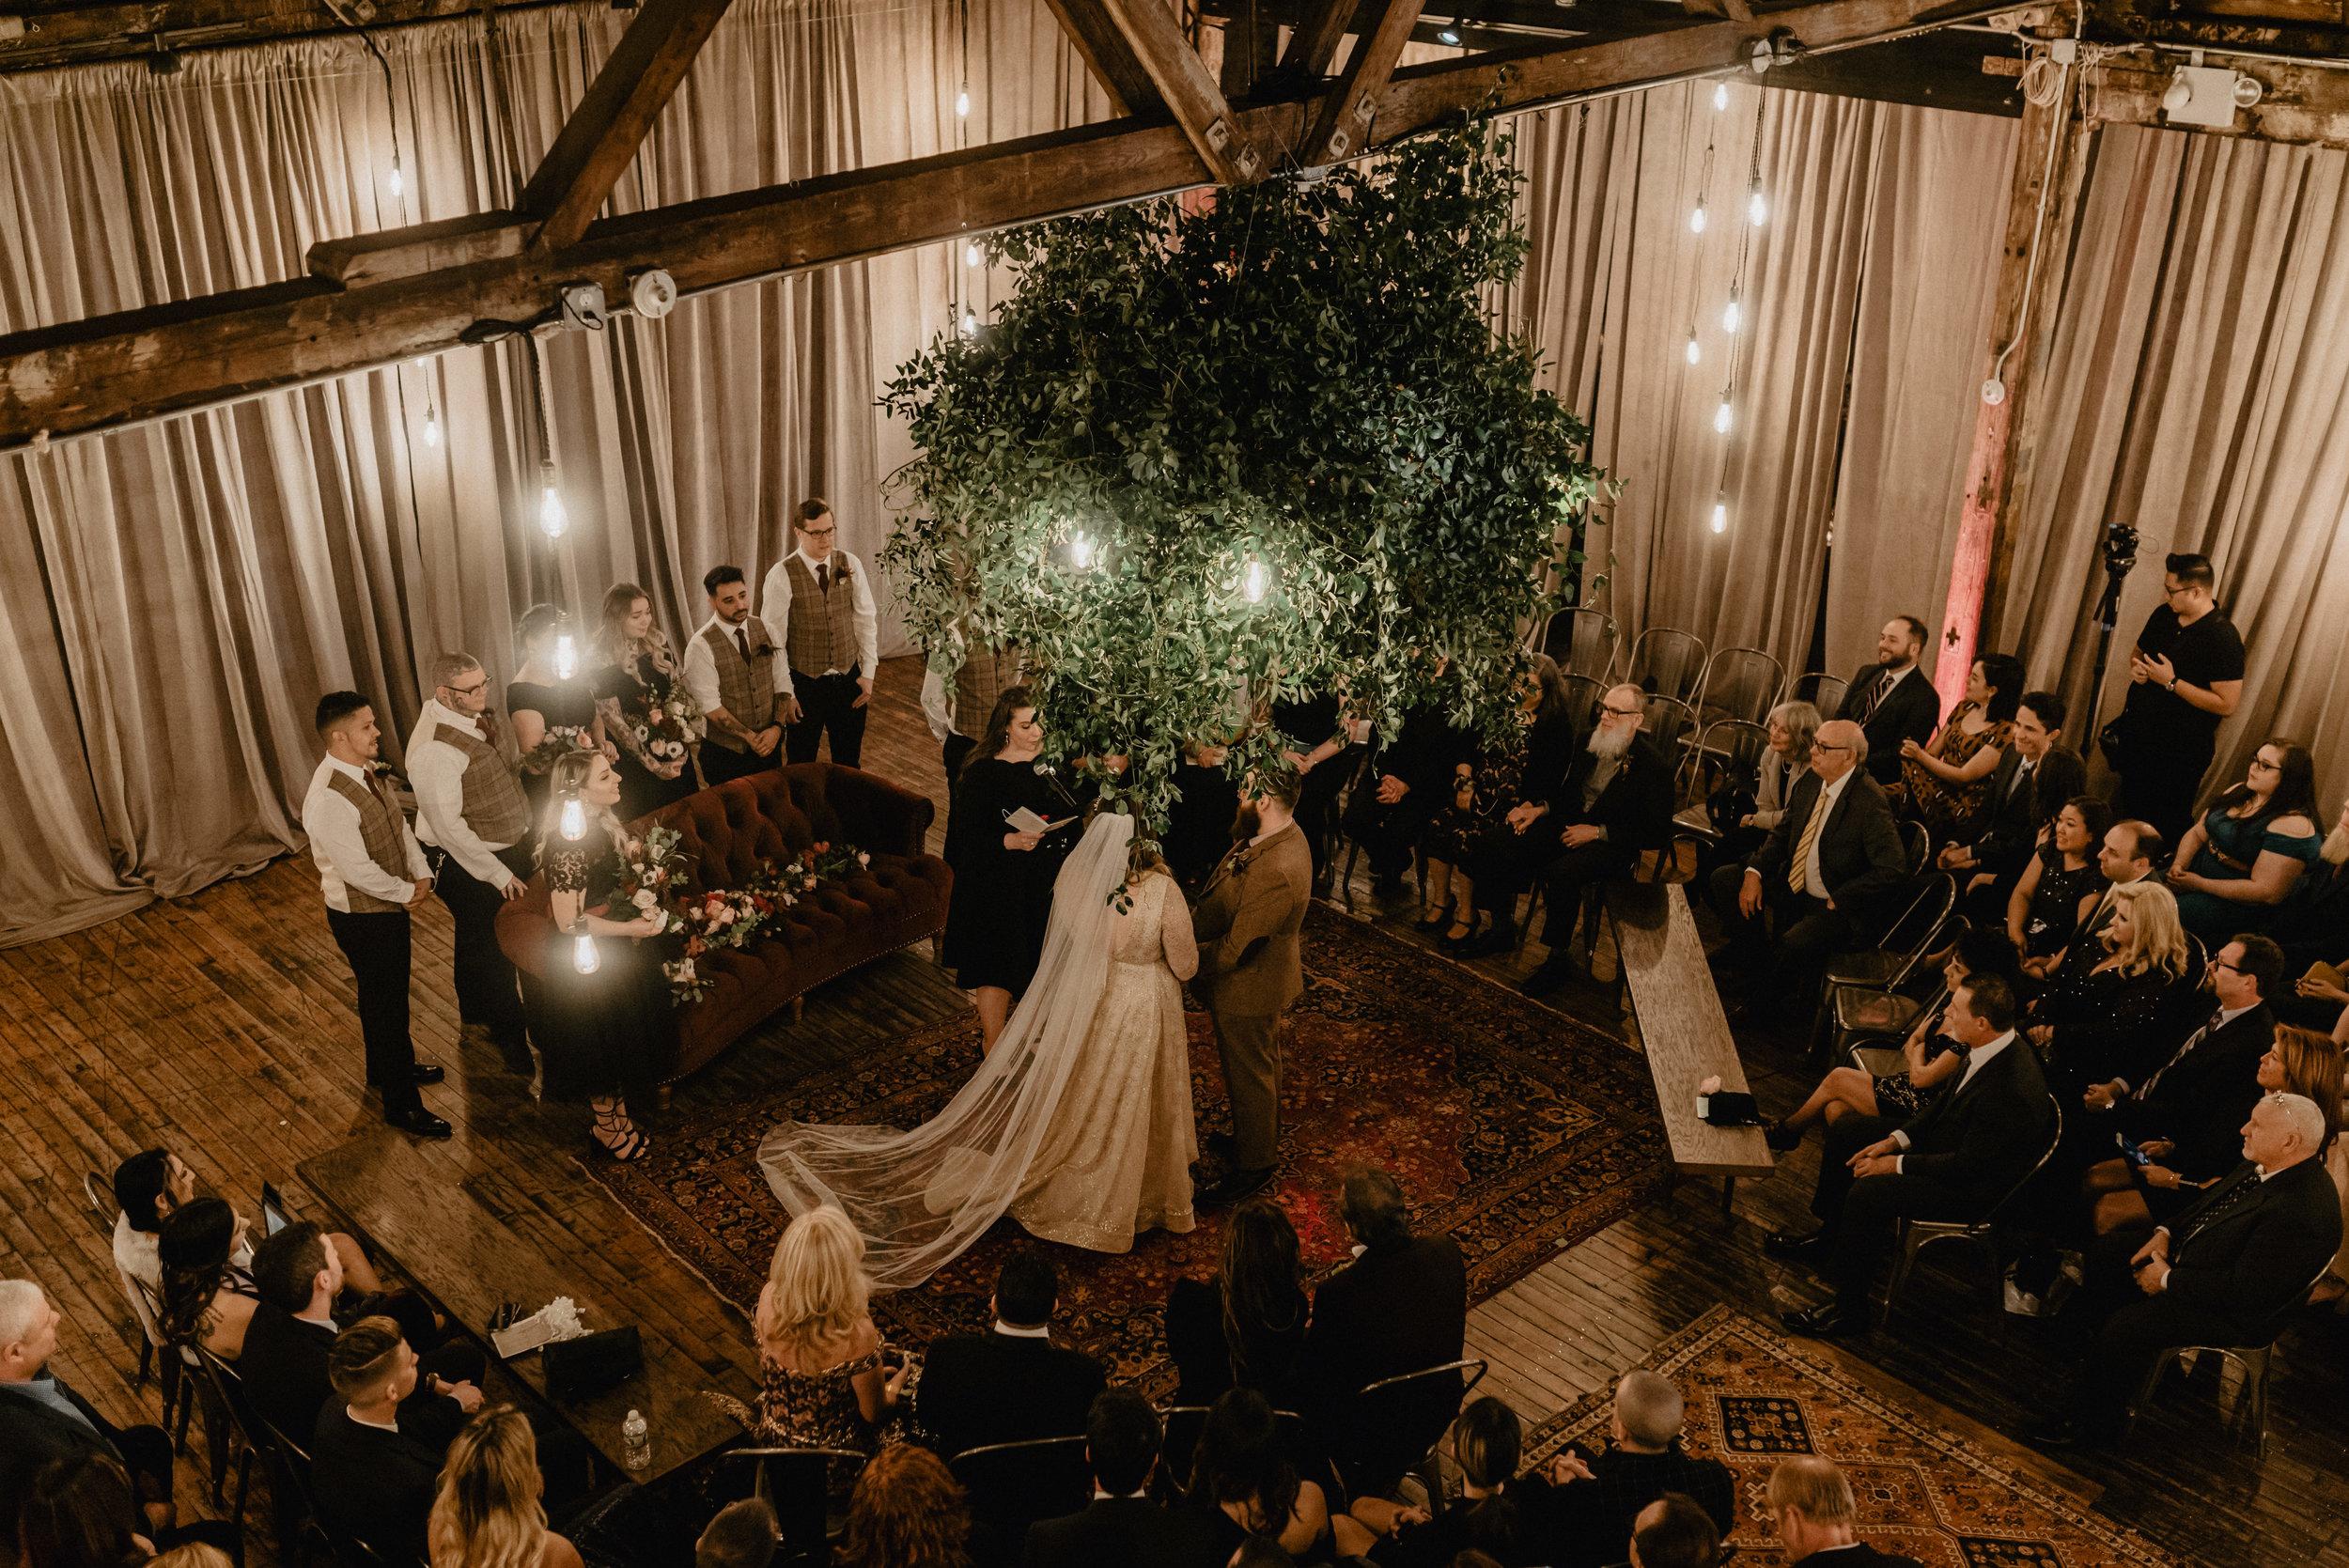 greenpoint_loft_wedding_099.jpg